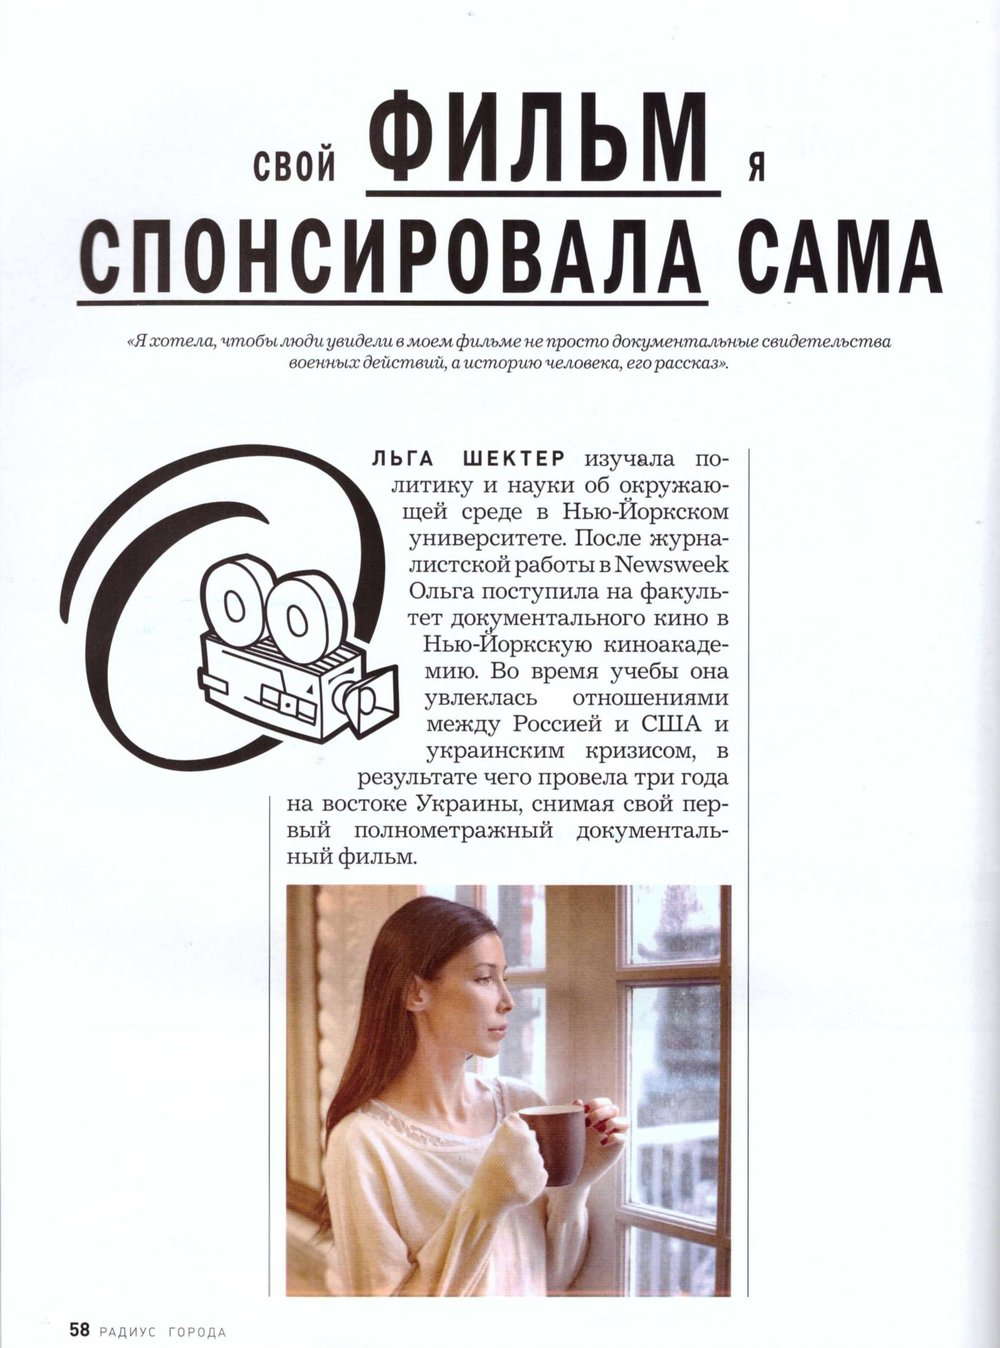 SCAN_20180528_132816250_1.jpg